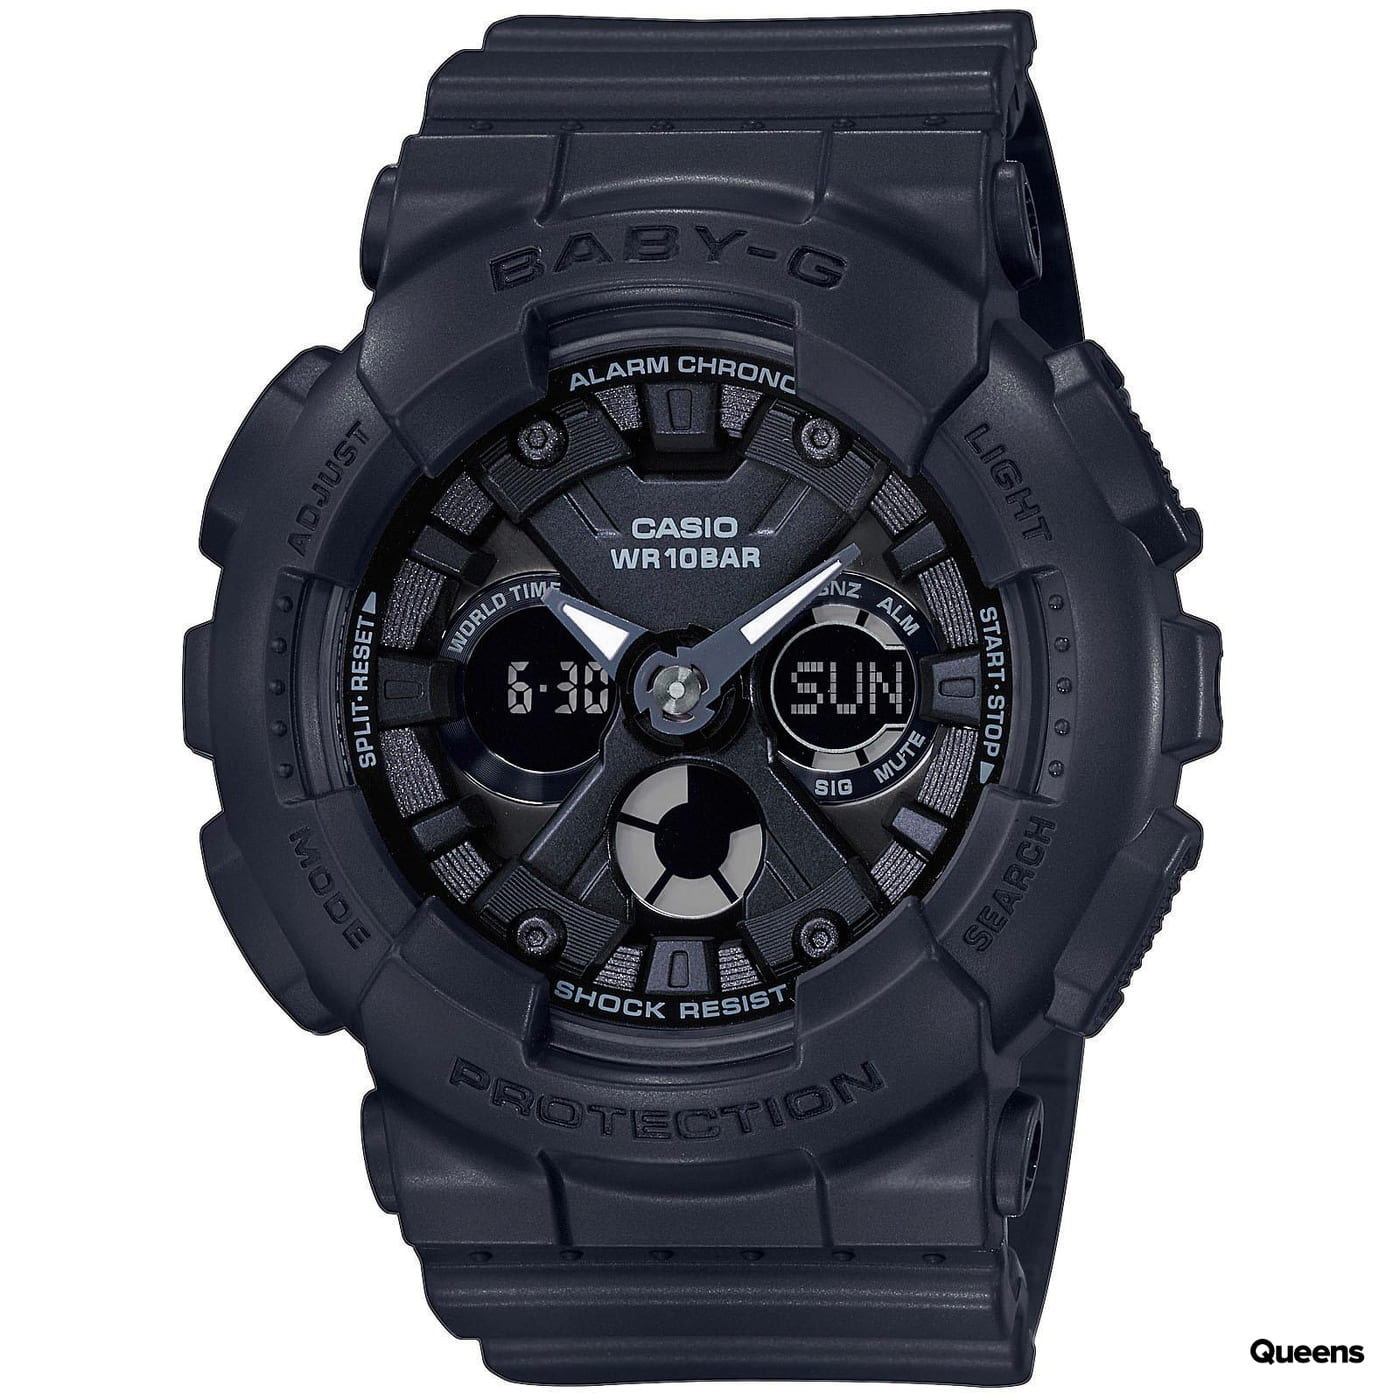 Casio Baby-G BA 130-1AER black satin